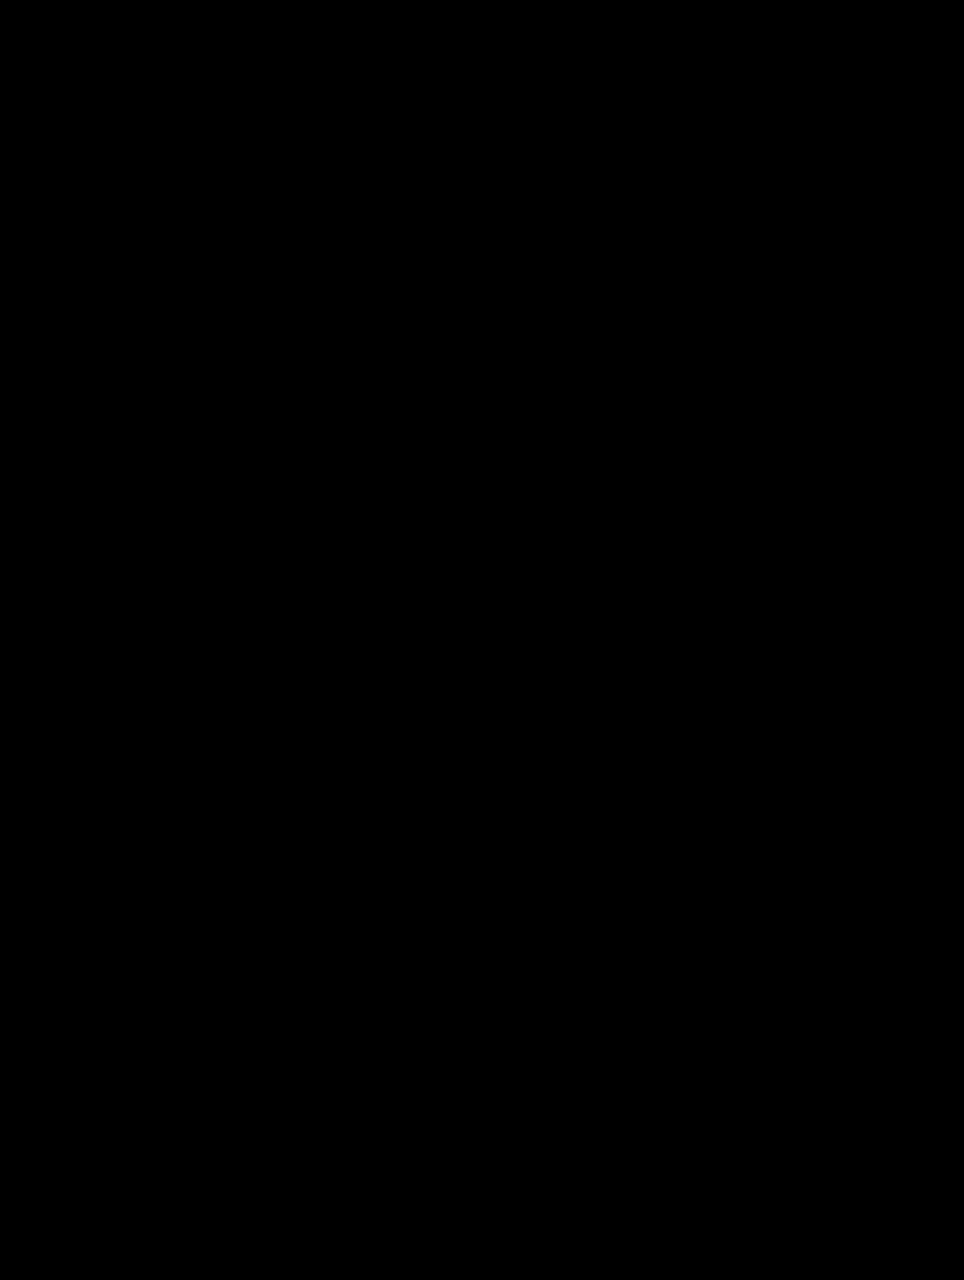 Anchor Nautical Symbol Emblem PNG Image